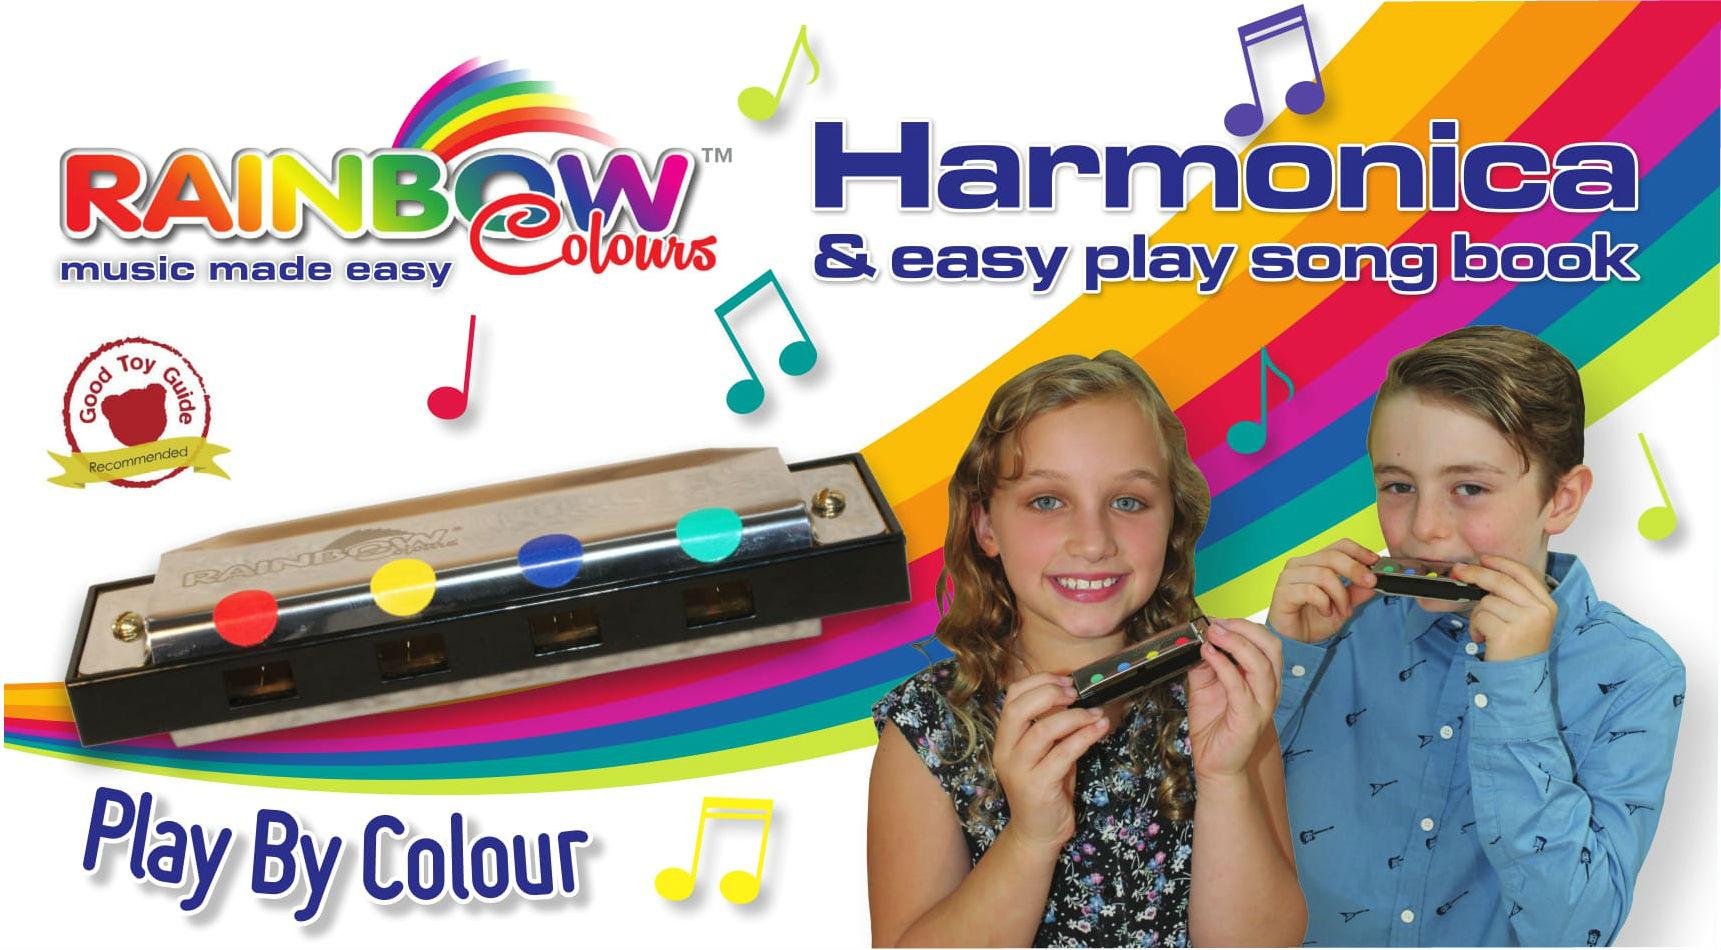 HarmonicaBox.jpg